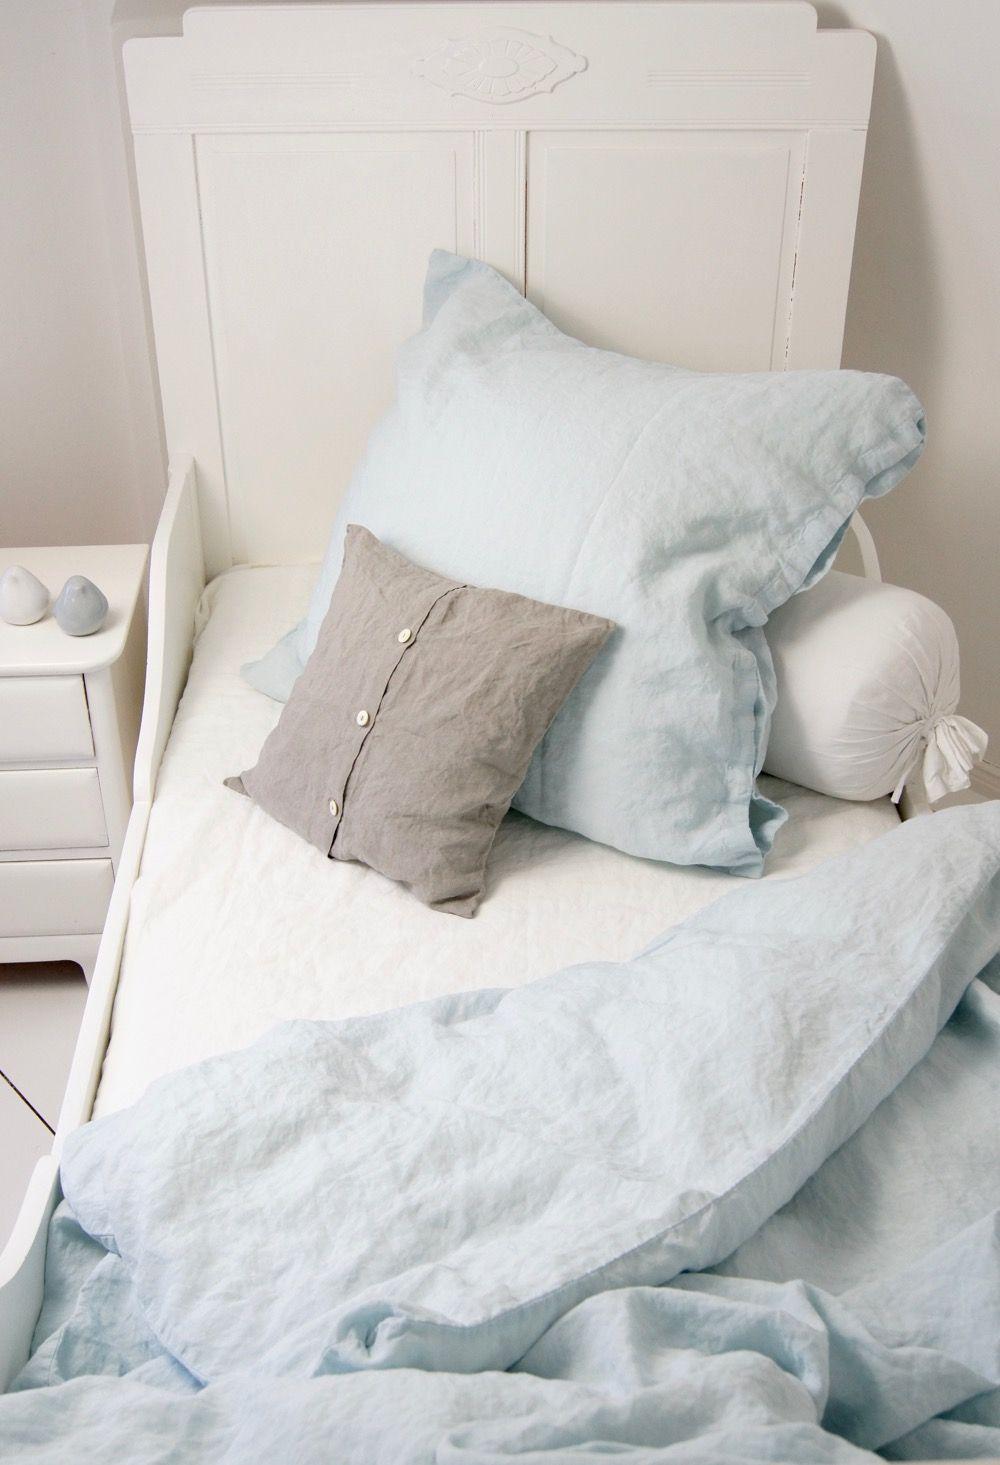 leinen bettw sche stone washed bedlinen in der trendfarbe des sommers hellblau http boheme. Black Bedroom Furniture Sets. Home Design Ideas